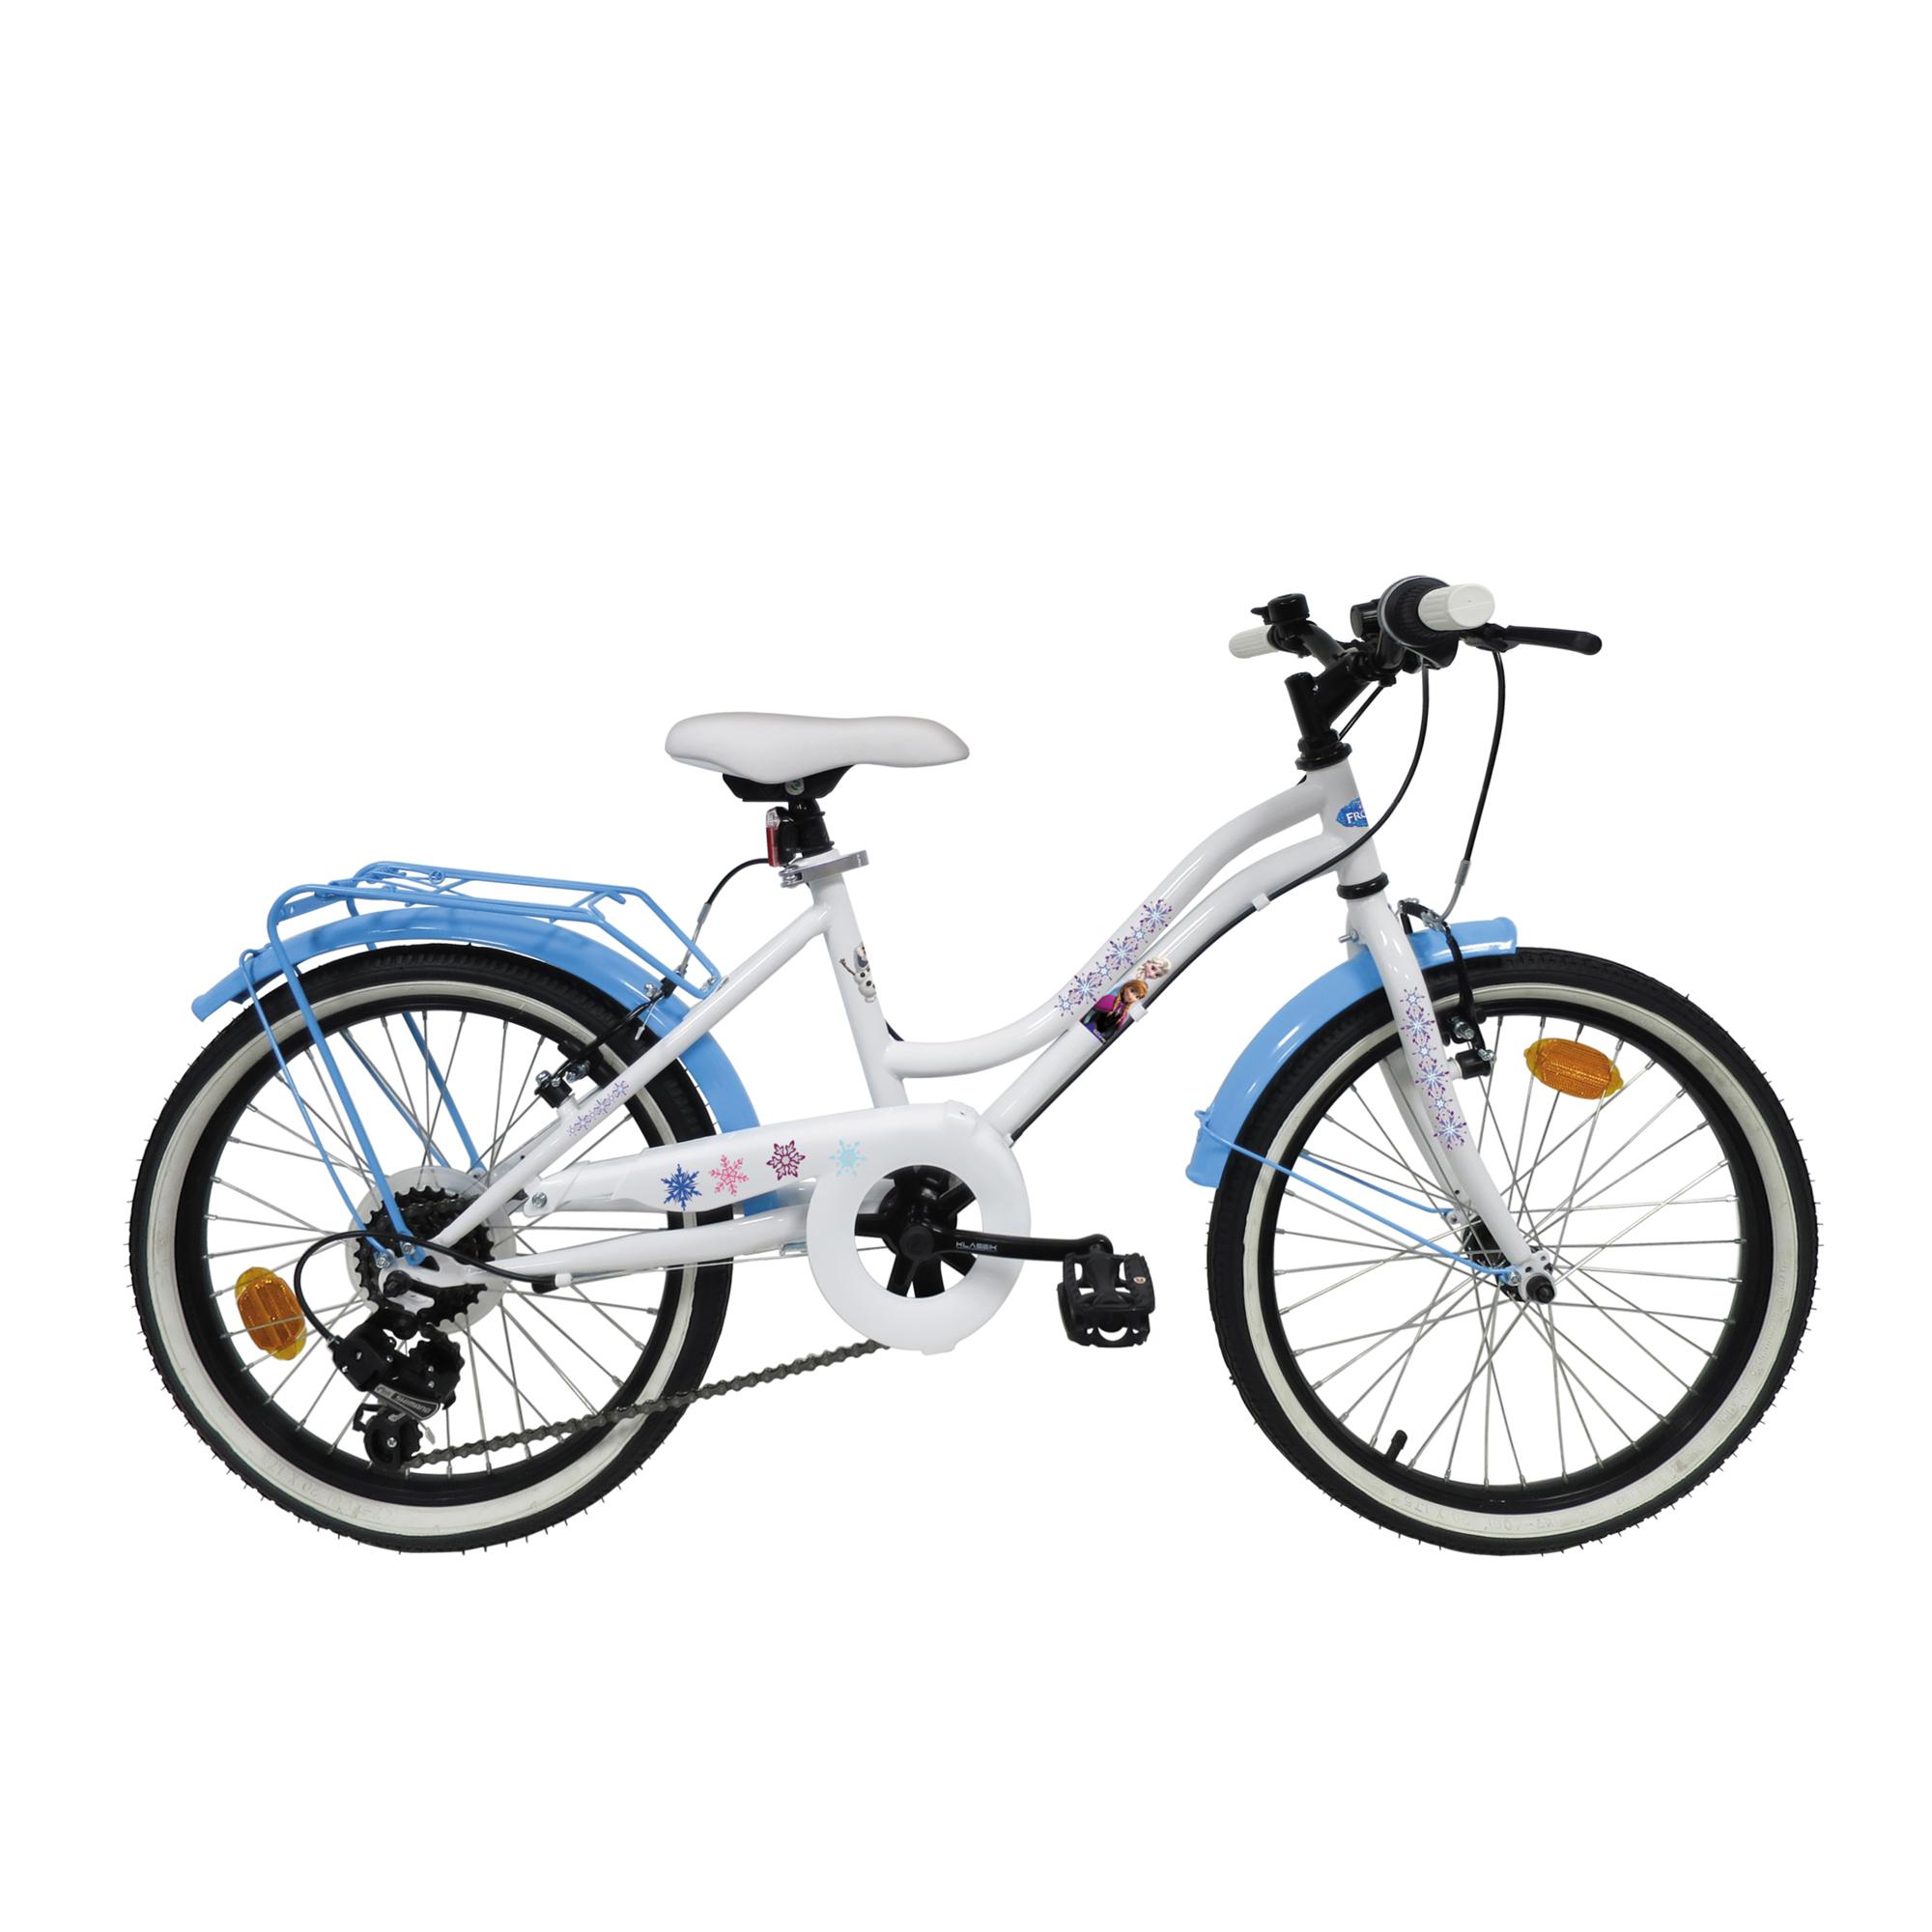 Bici Frozen 20 Disney Toys Center